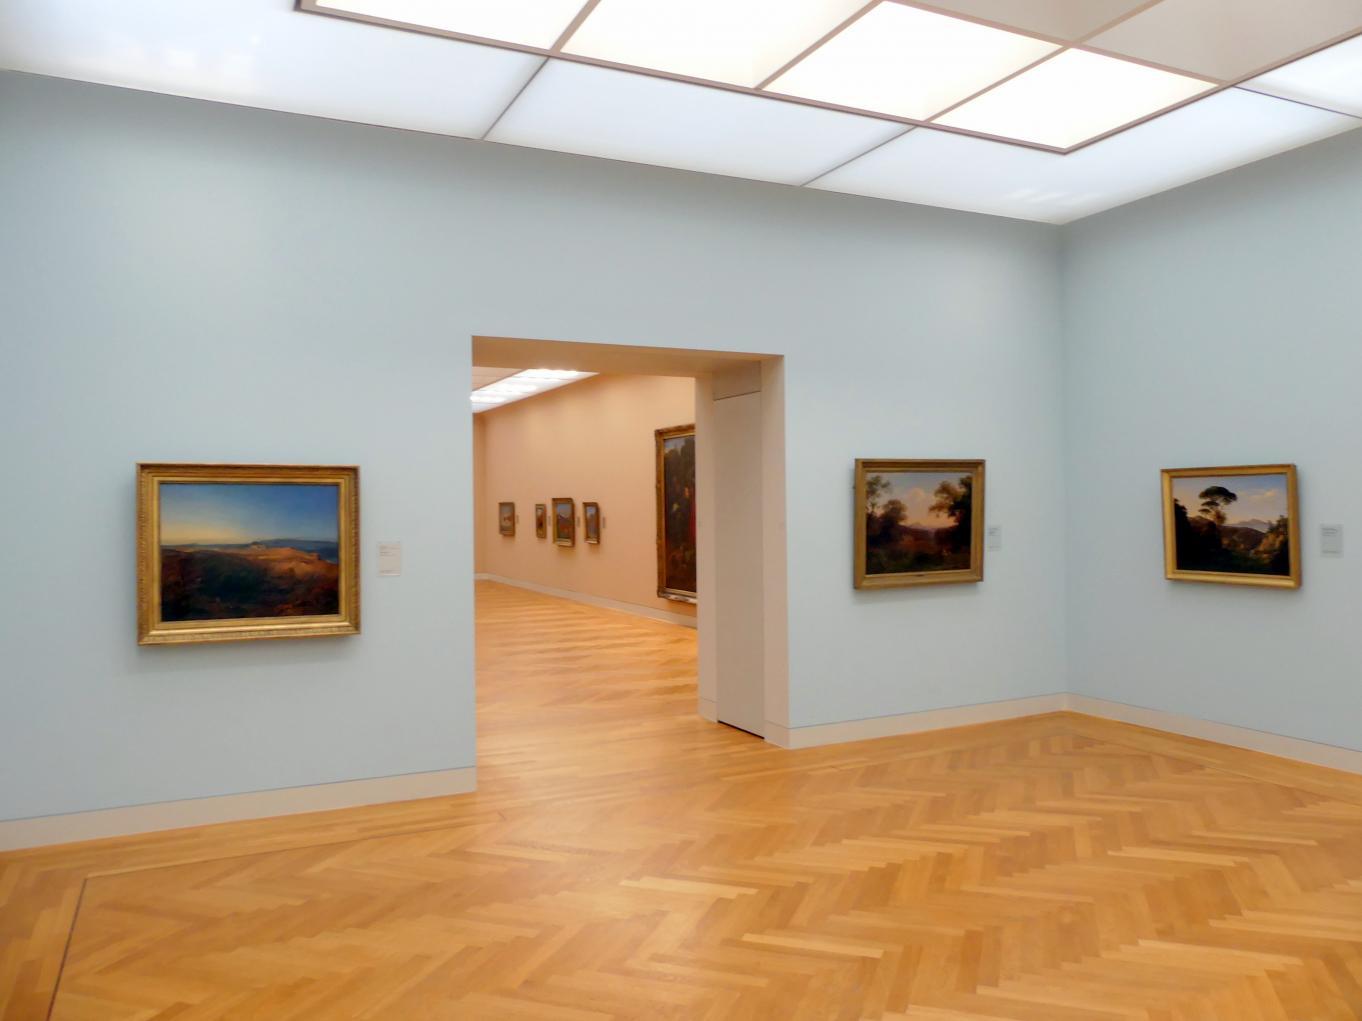 Schweinfurt, Museum Georg Schäfer, Saal 11, Bild 2/4